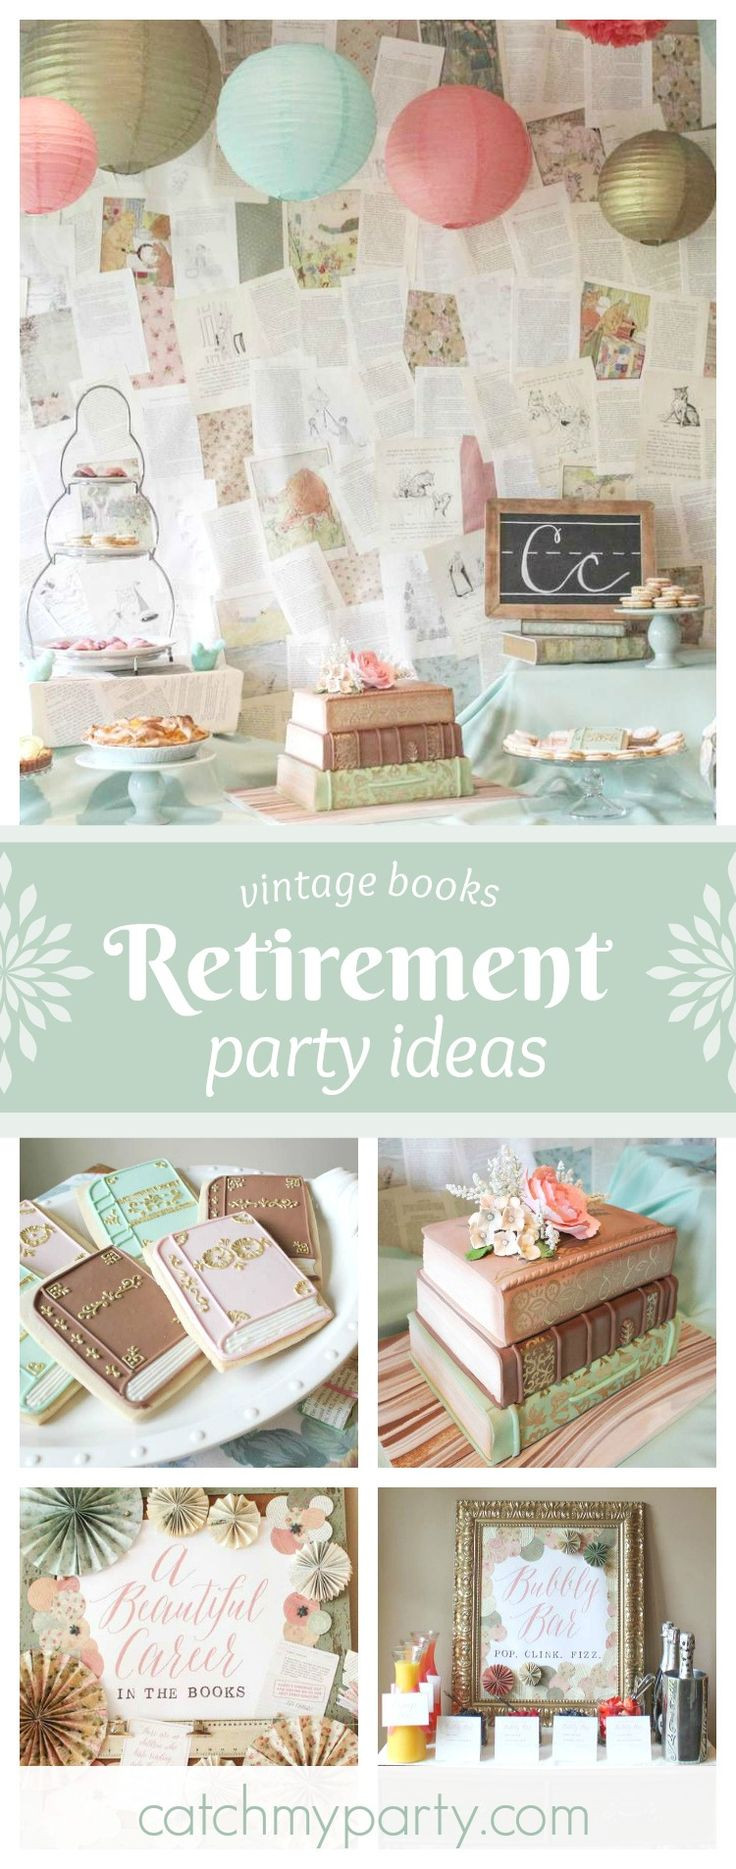 Best Retirement Party Ideas  Best 25 Retirement party themes ideas on Pinterest